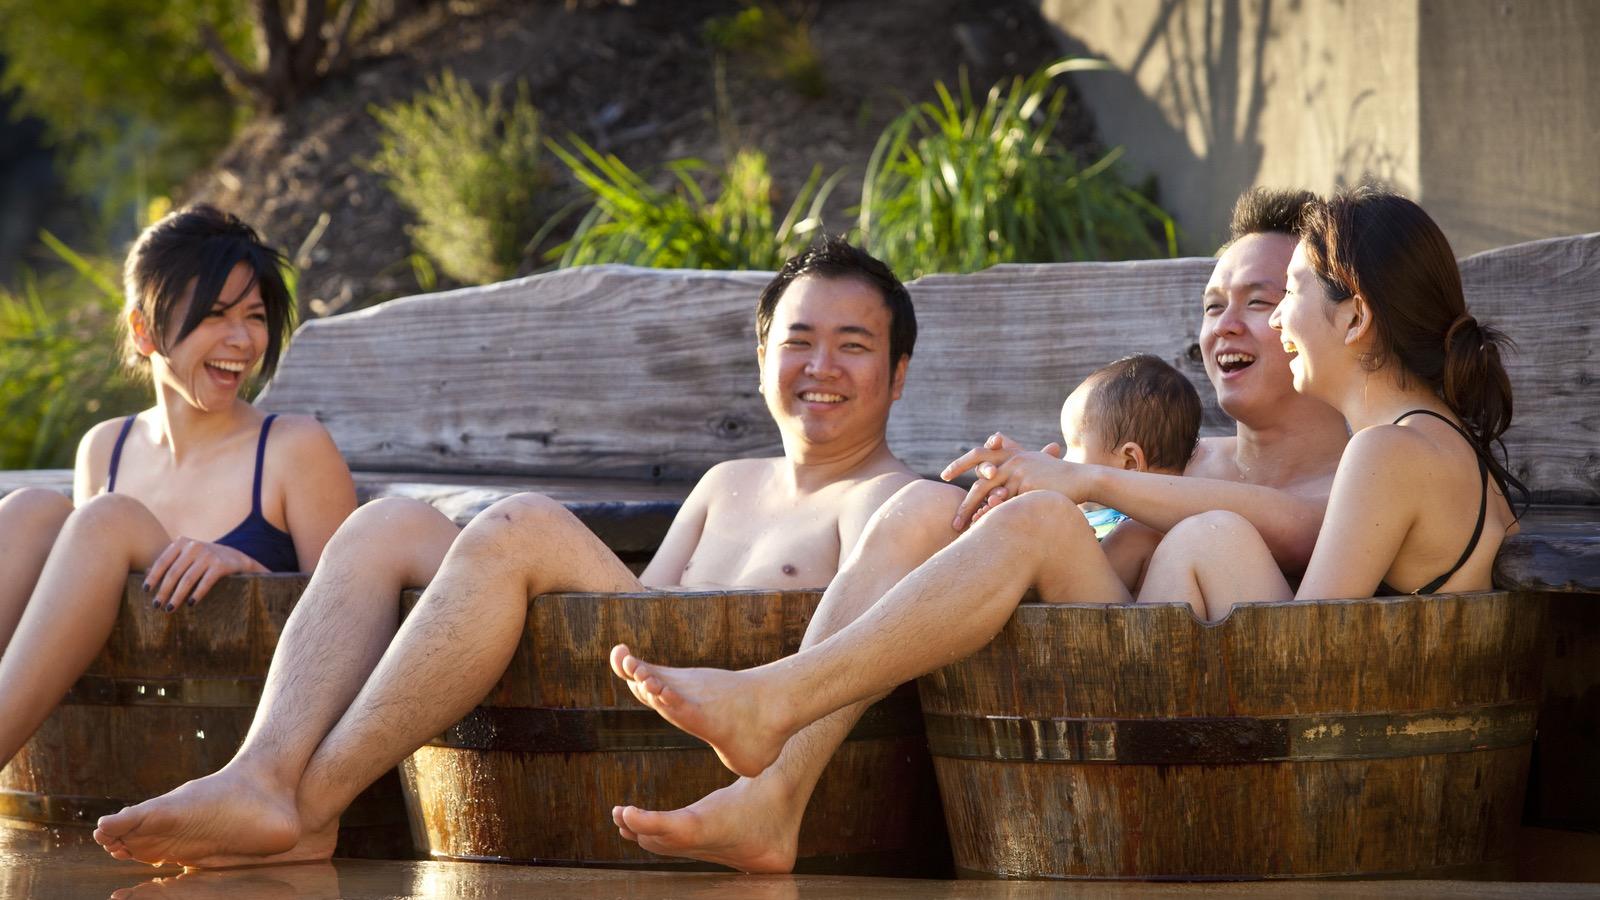 Barrels of fun at the Hot Springs